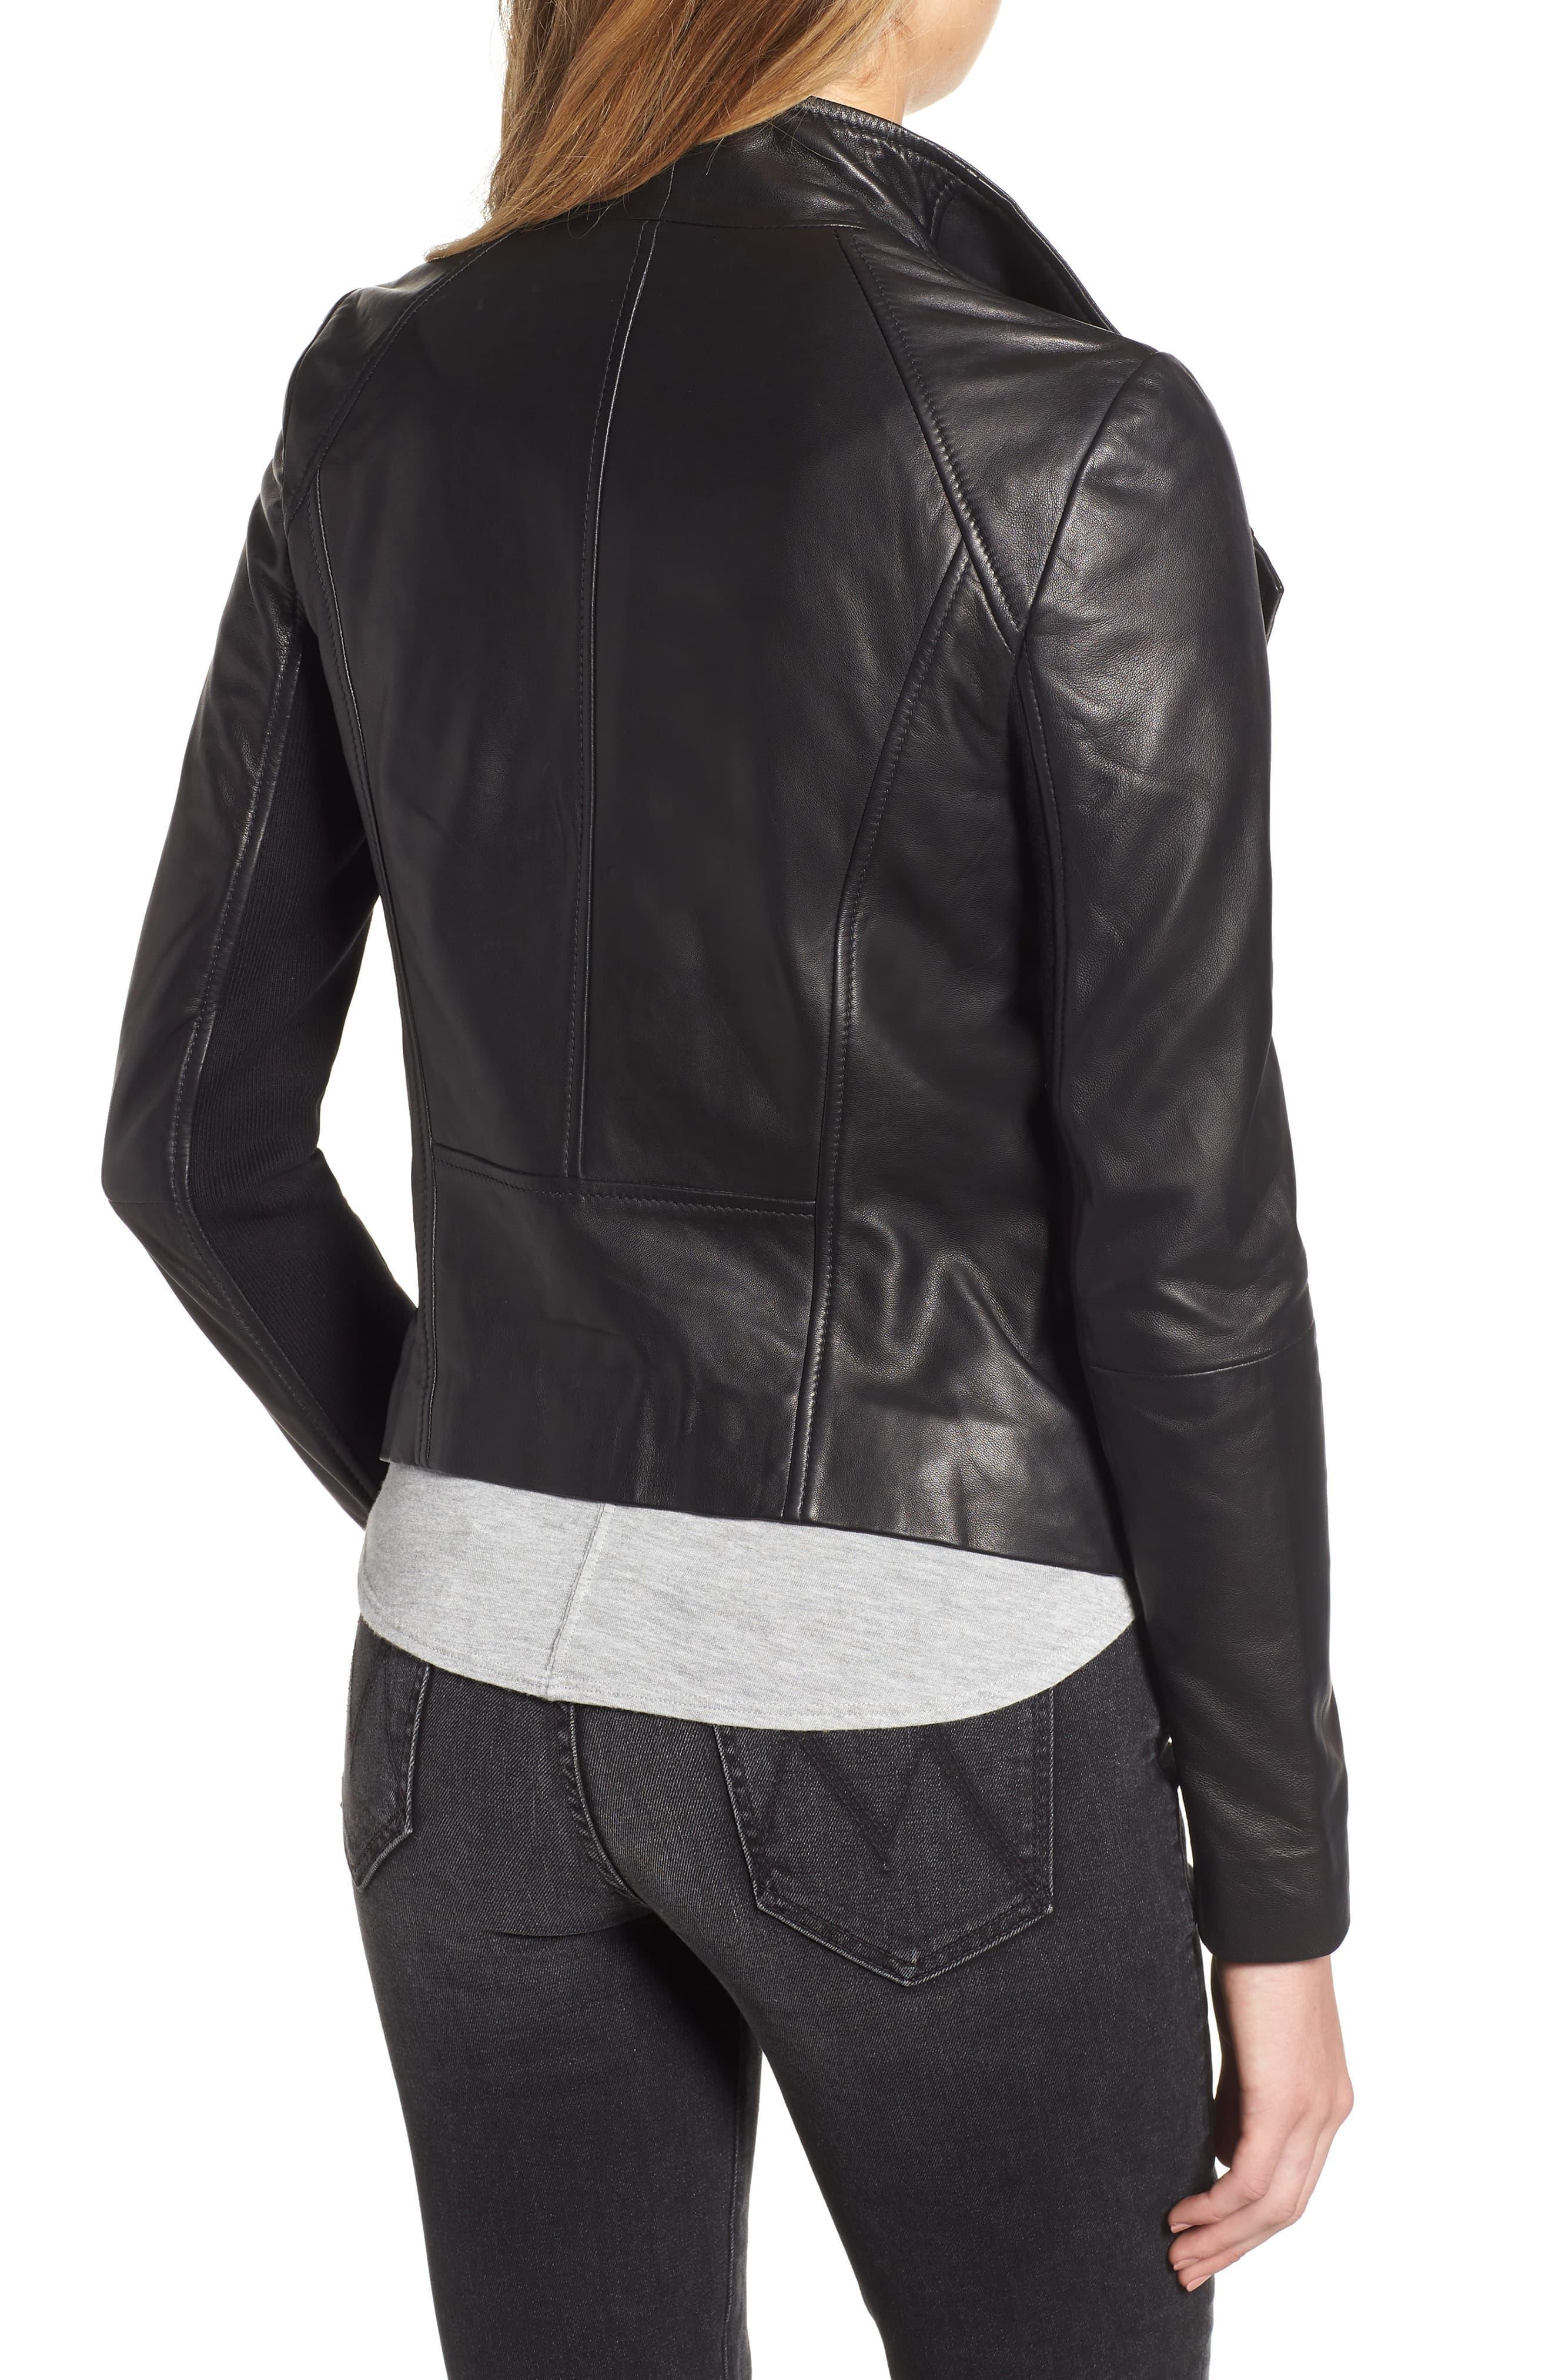 eb2f9009013 Chelsea28 Black Leather Moto Jacket. View fullscreen